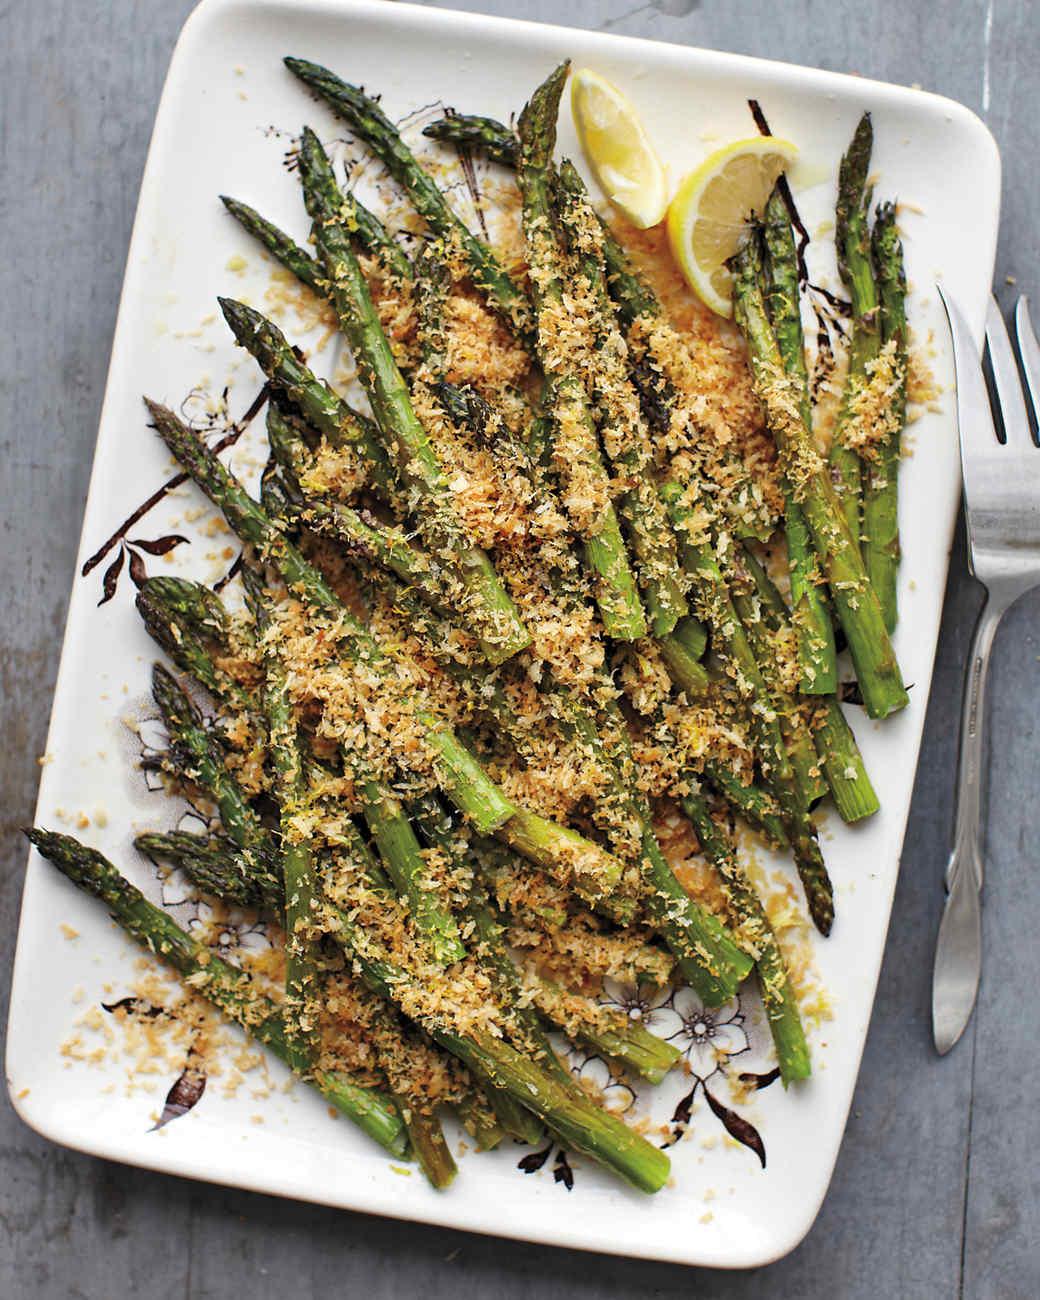 Roasted Asparagus with Lemony Breadcrumbs